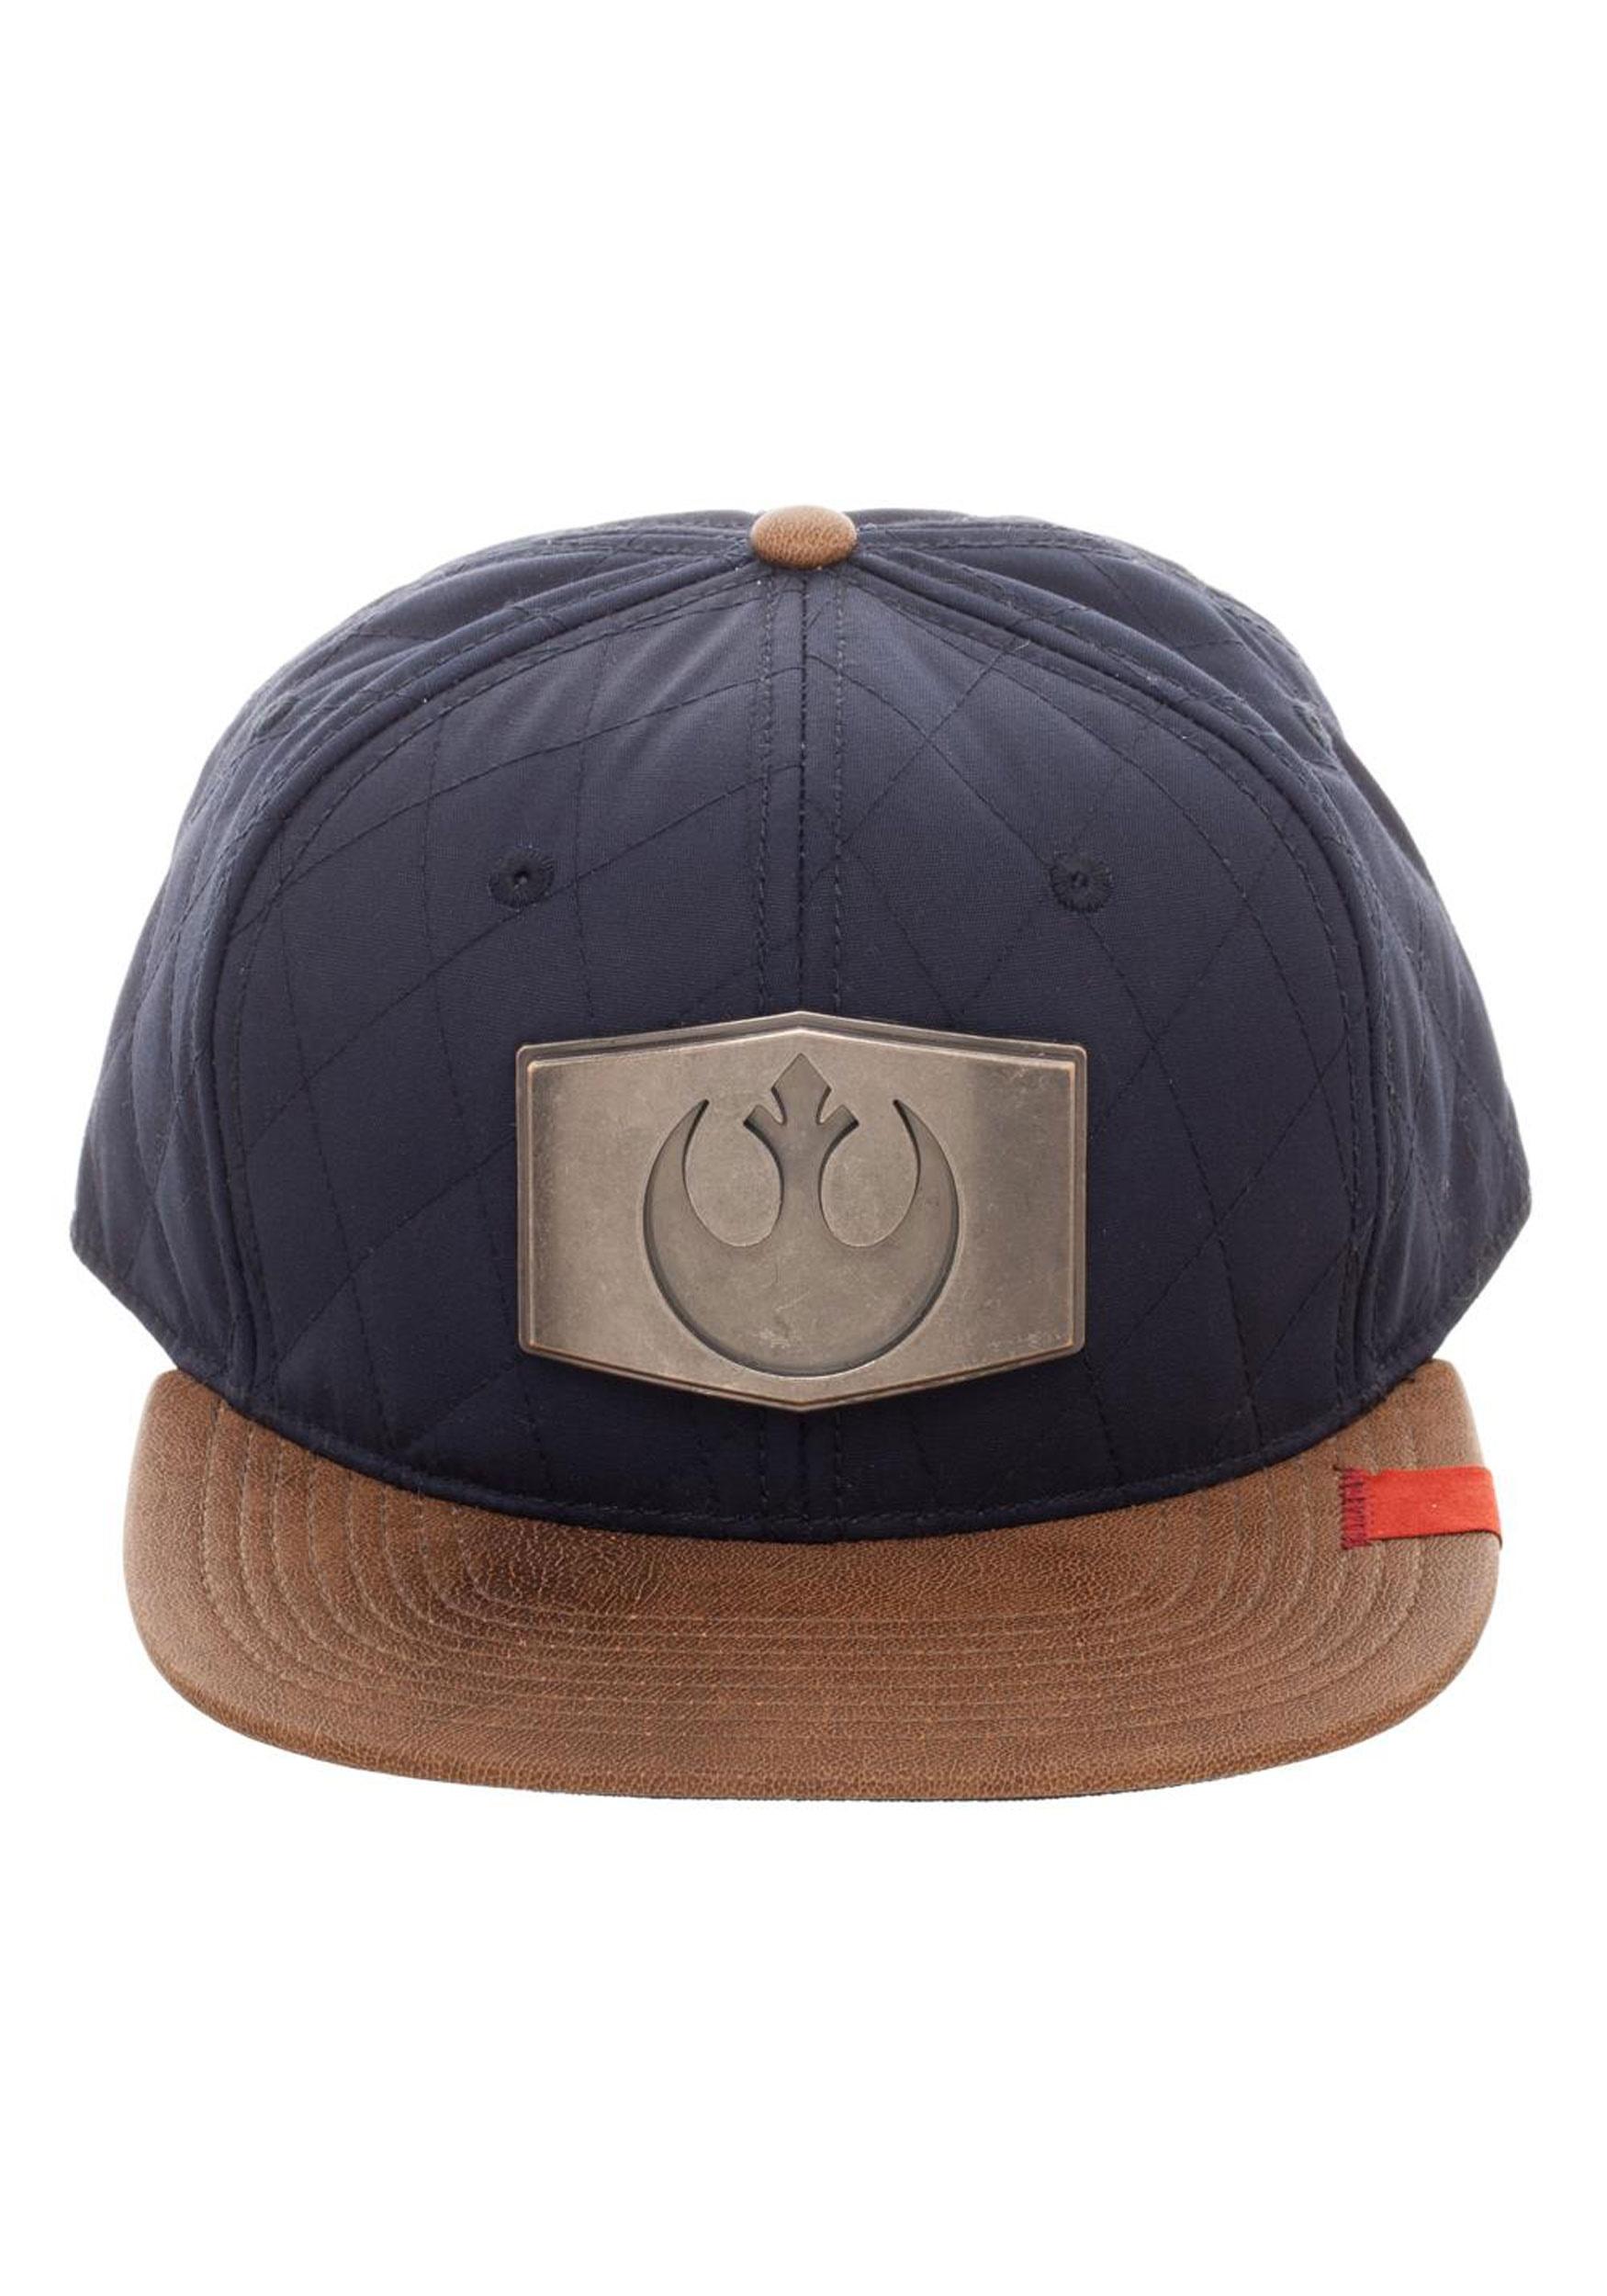 Star Wars Han Solo Inspired Snapback Hat-7175